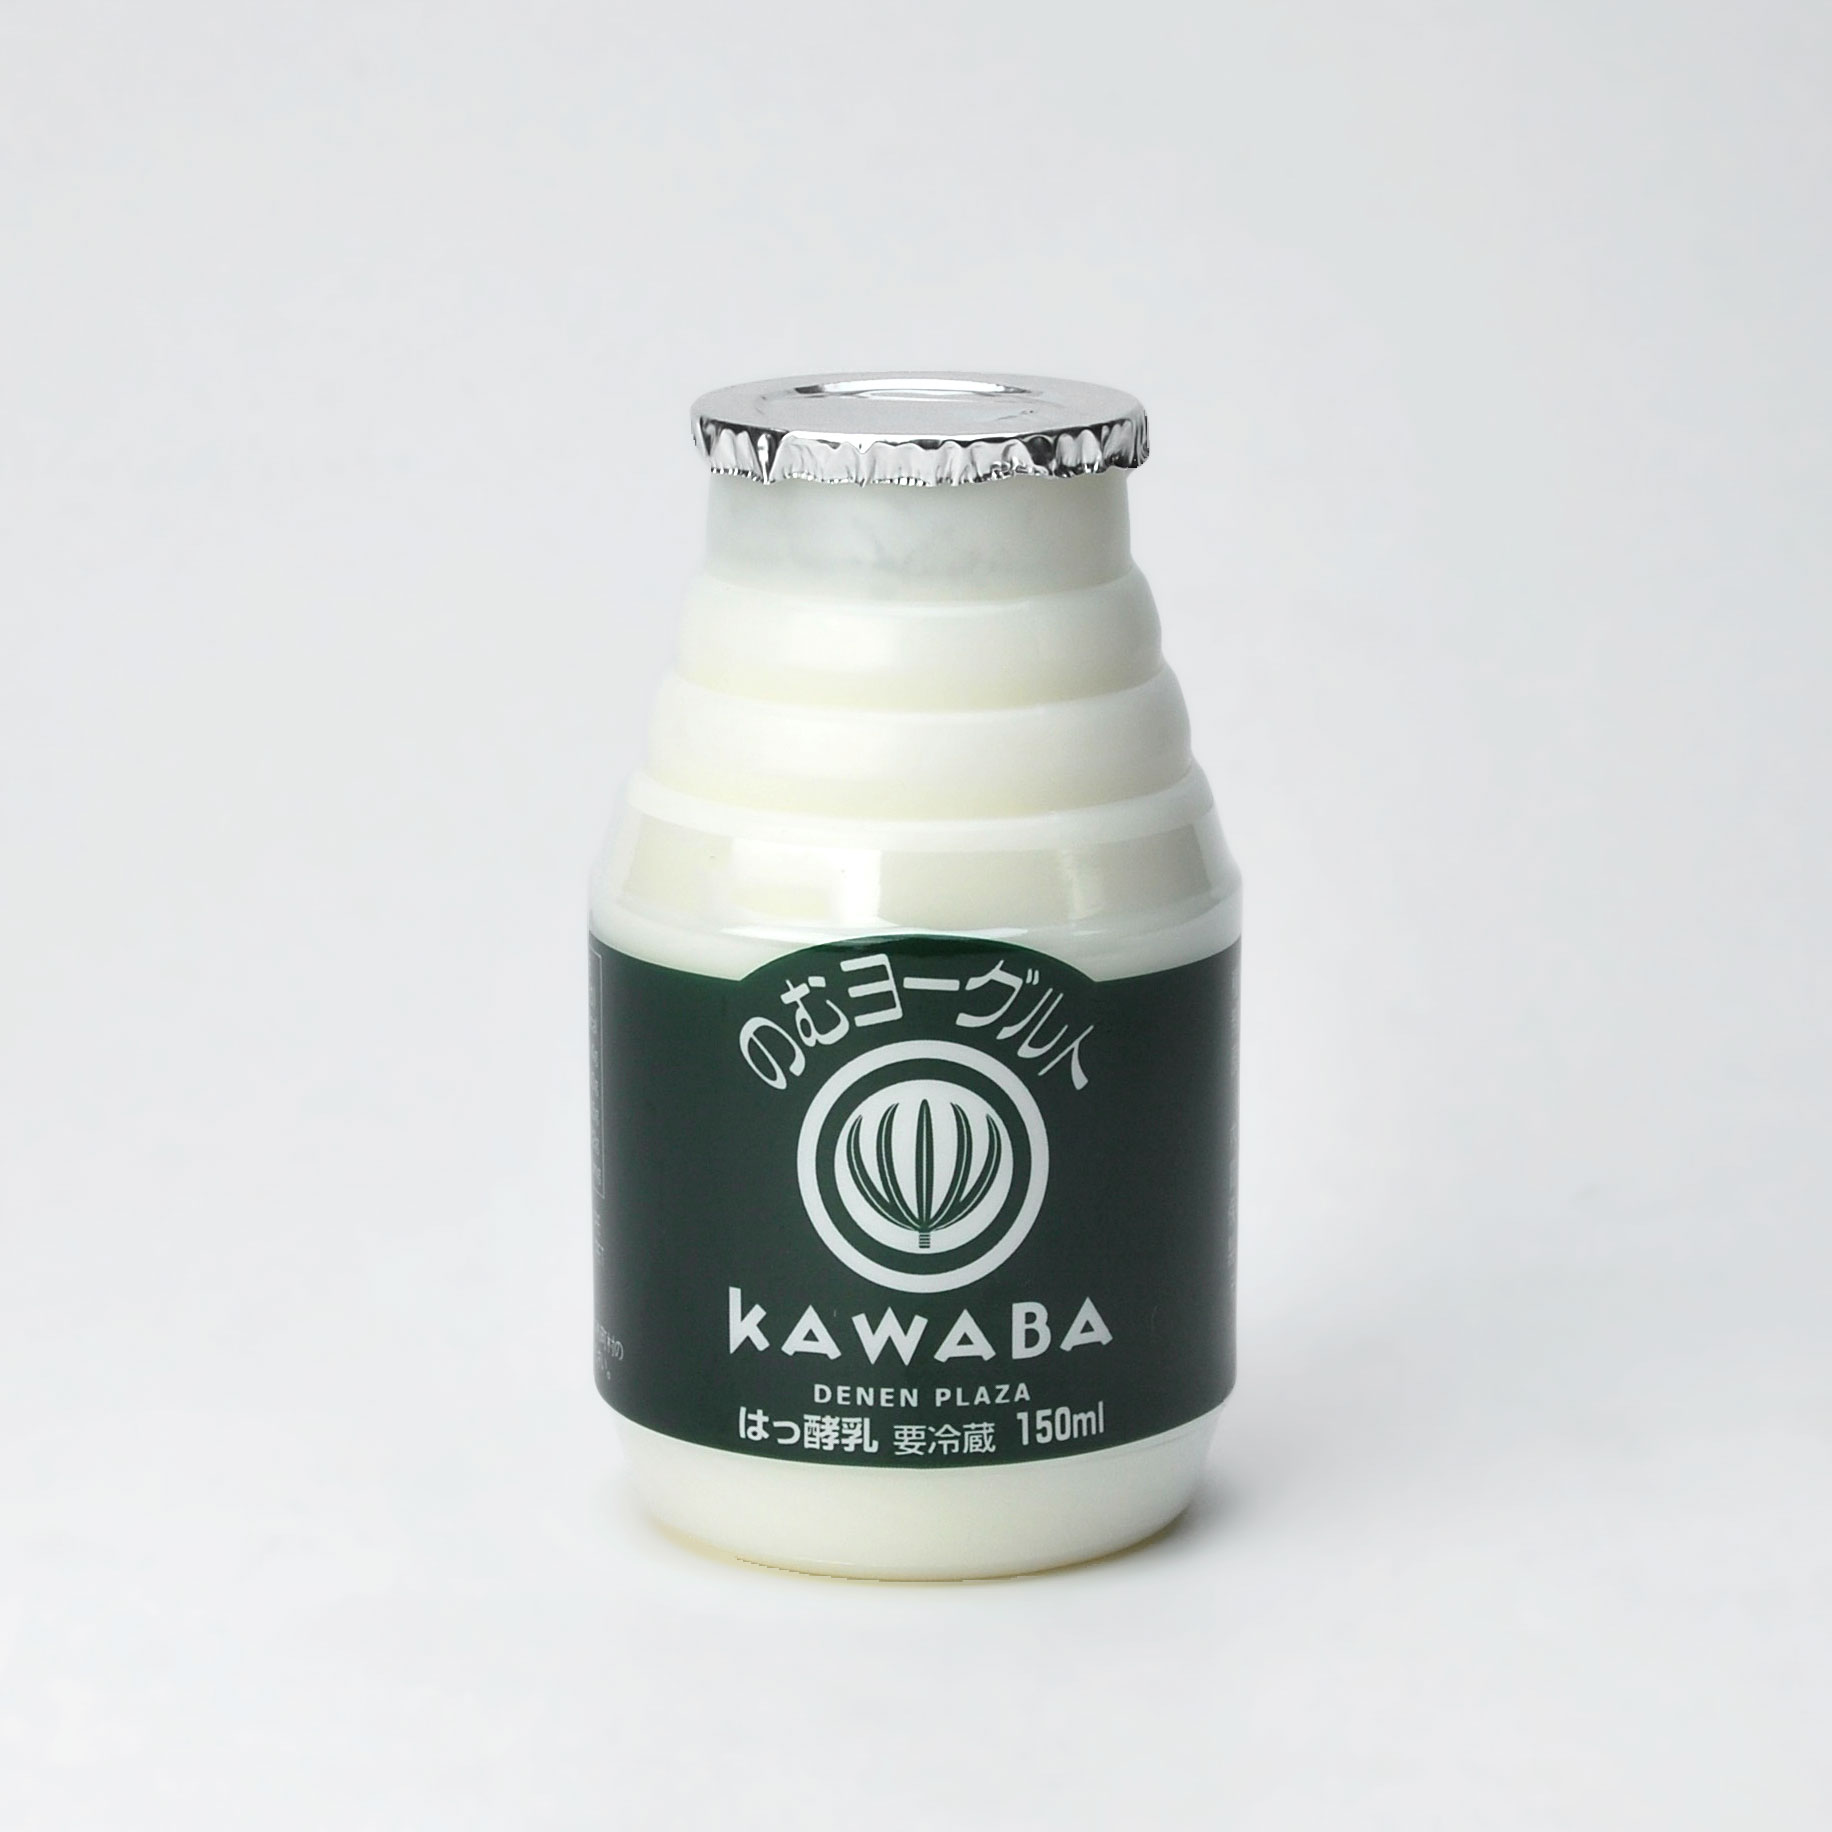 KAWABA ベーカリーセットの商品詳細イメージ-756